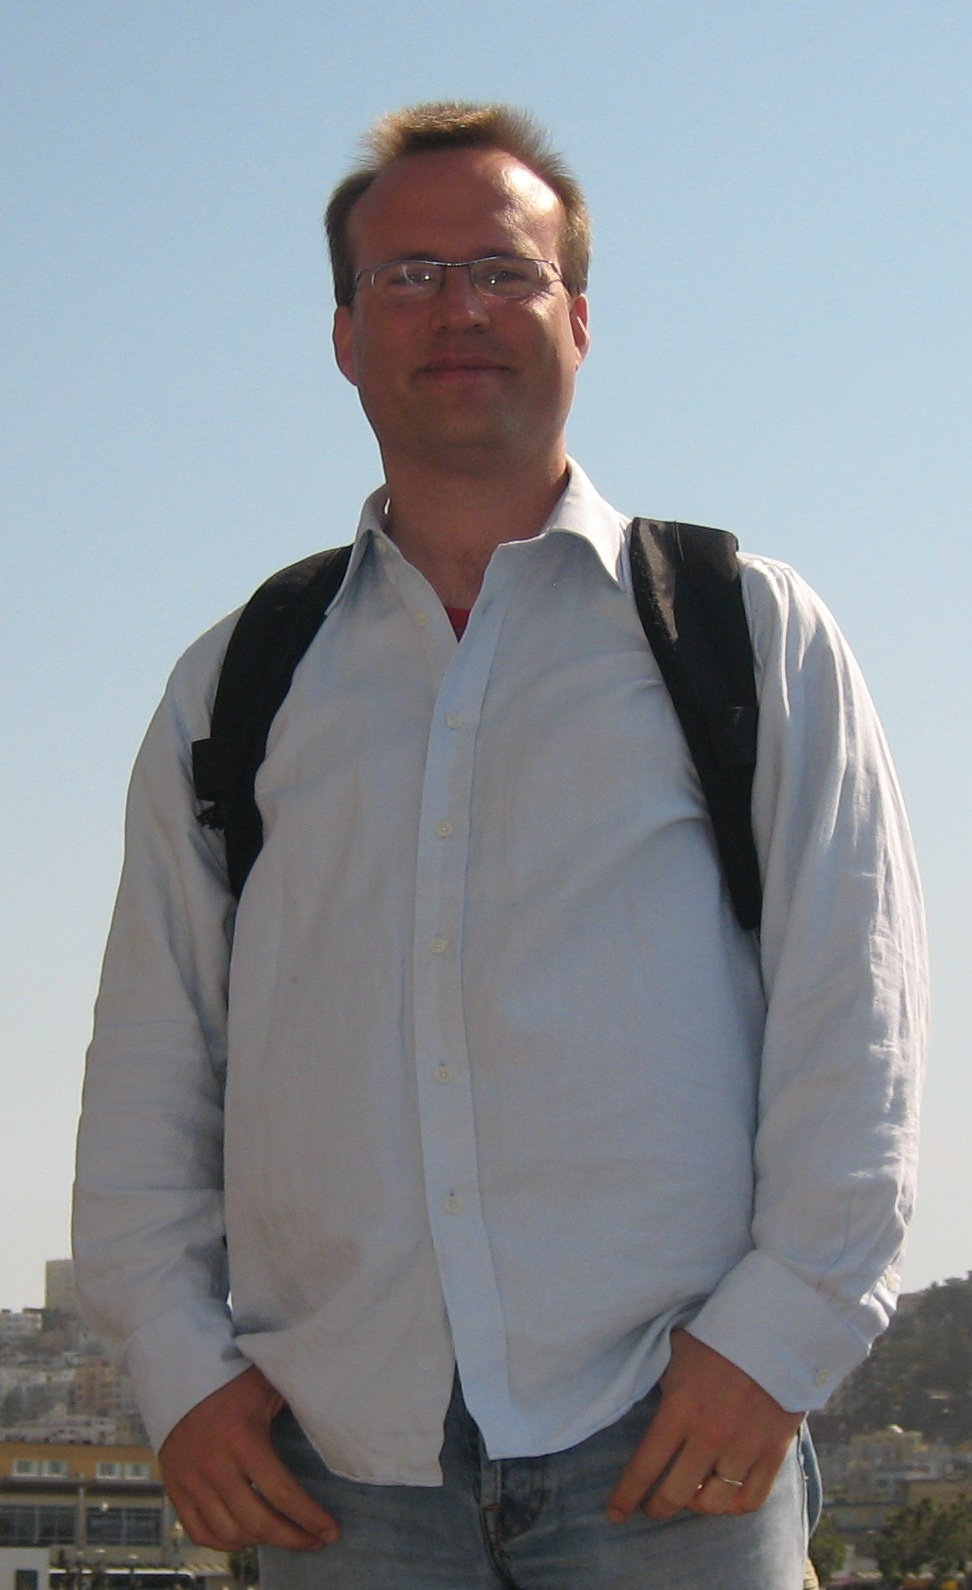 Anaya California Dissertation Doctoral Francisco San